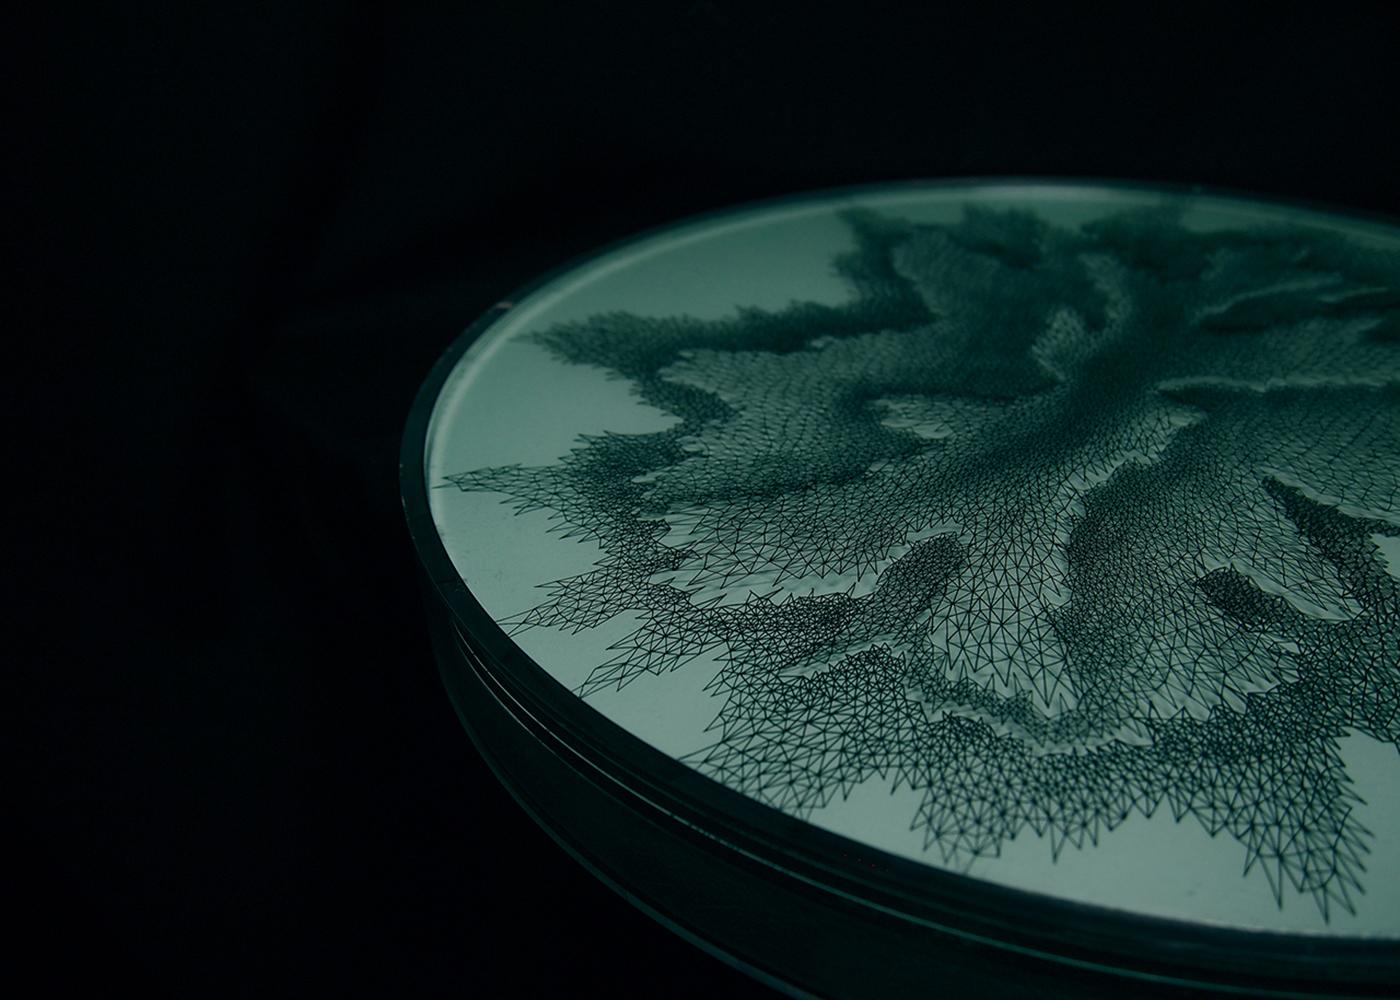 《aether》 2011年、アクリル板、顔料系インク